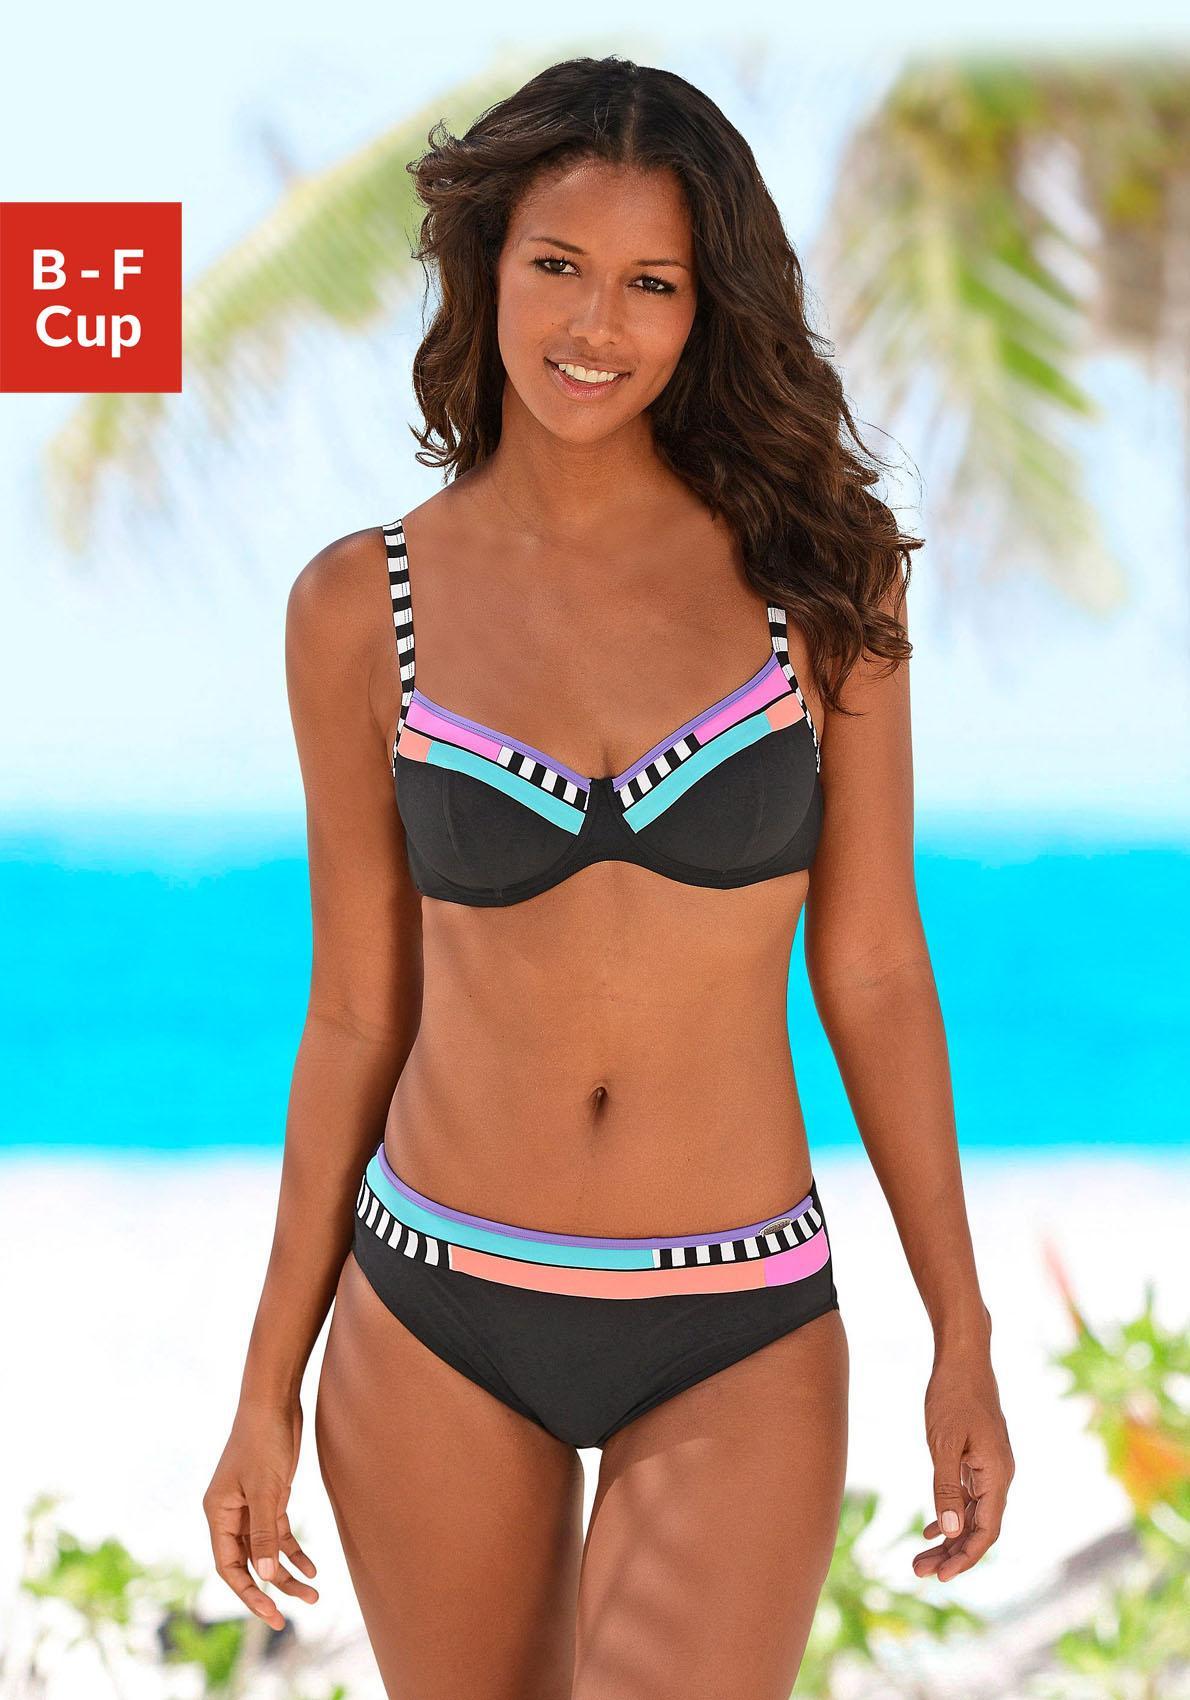 Sunflair Bügel-Bikini